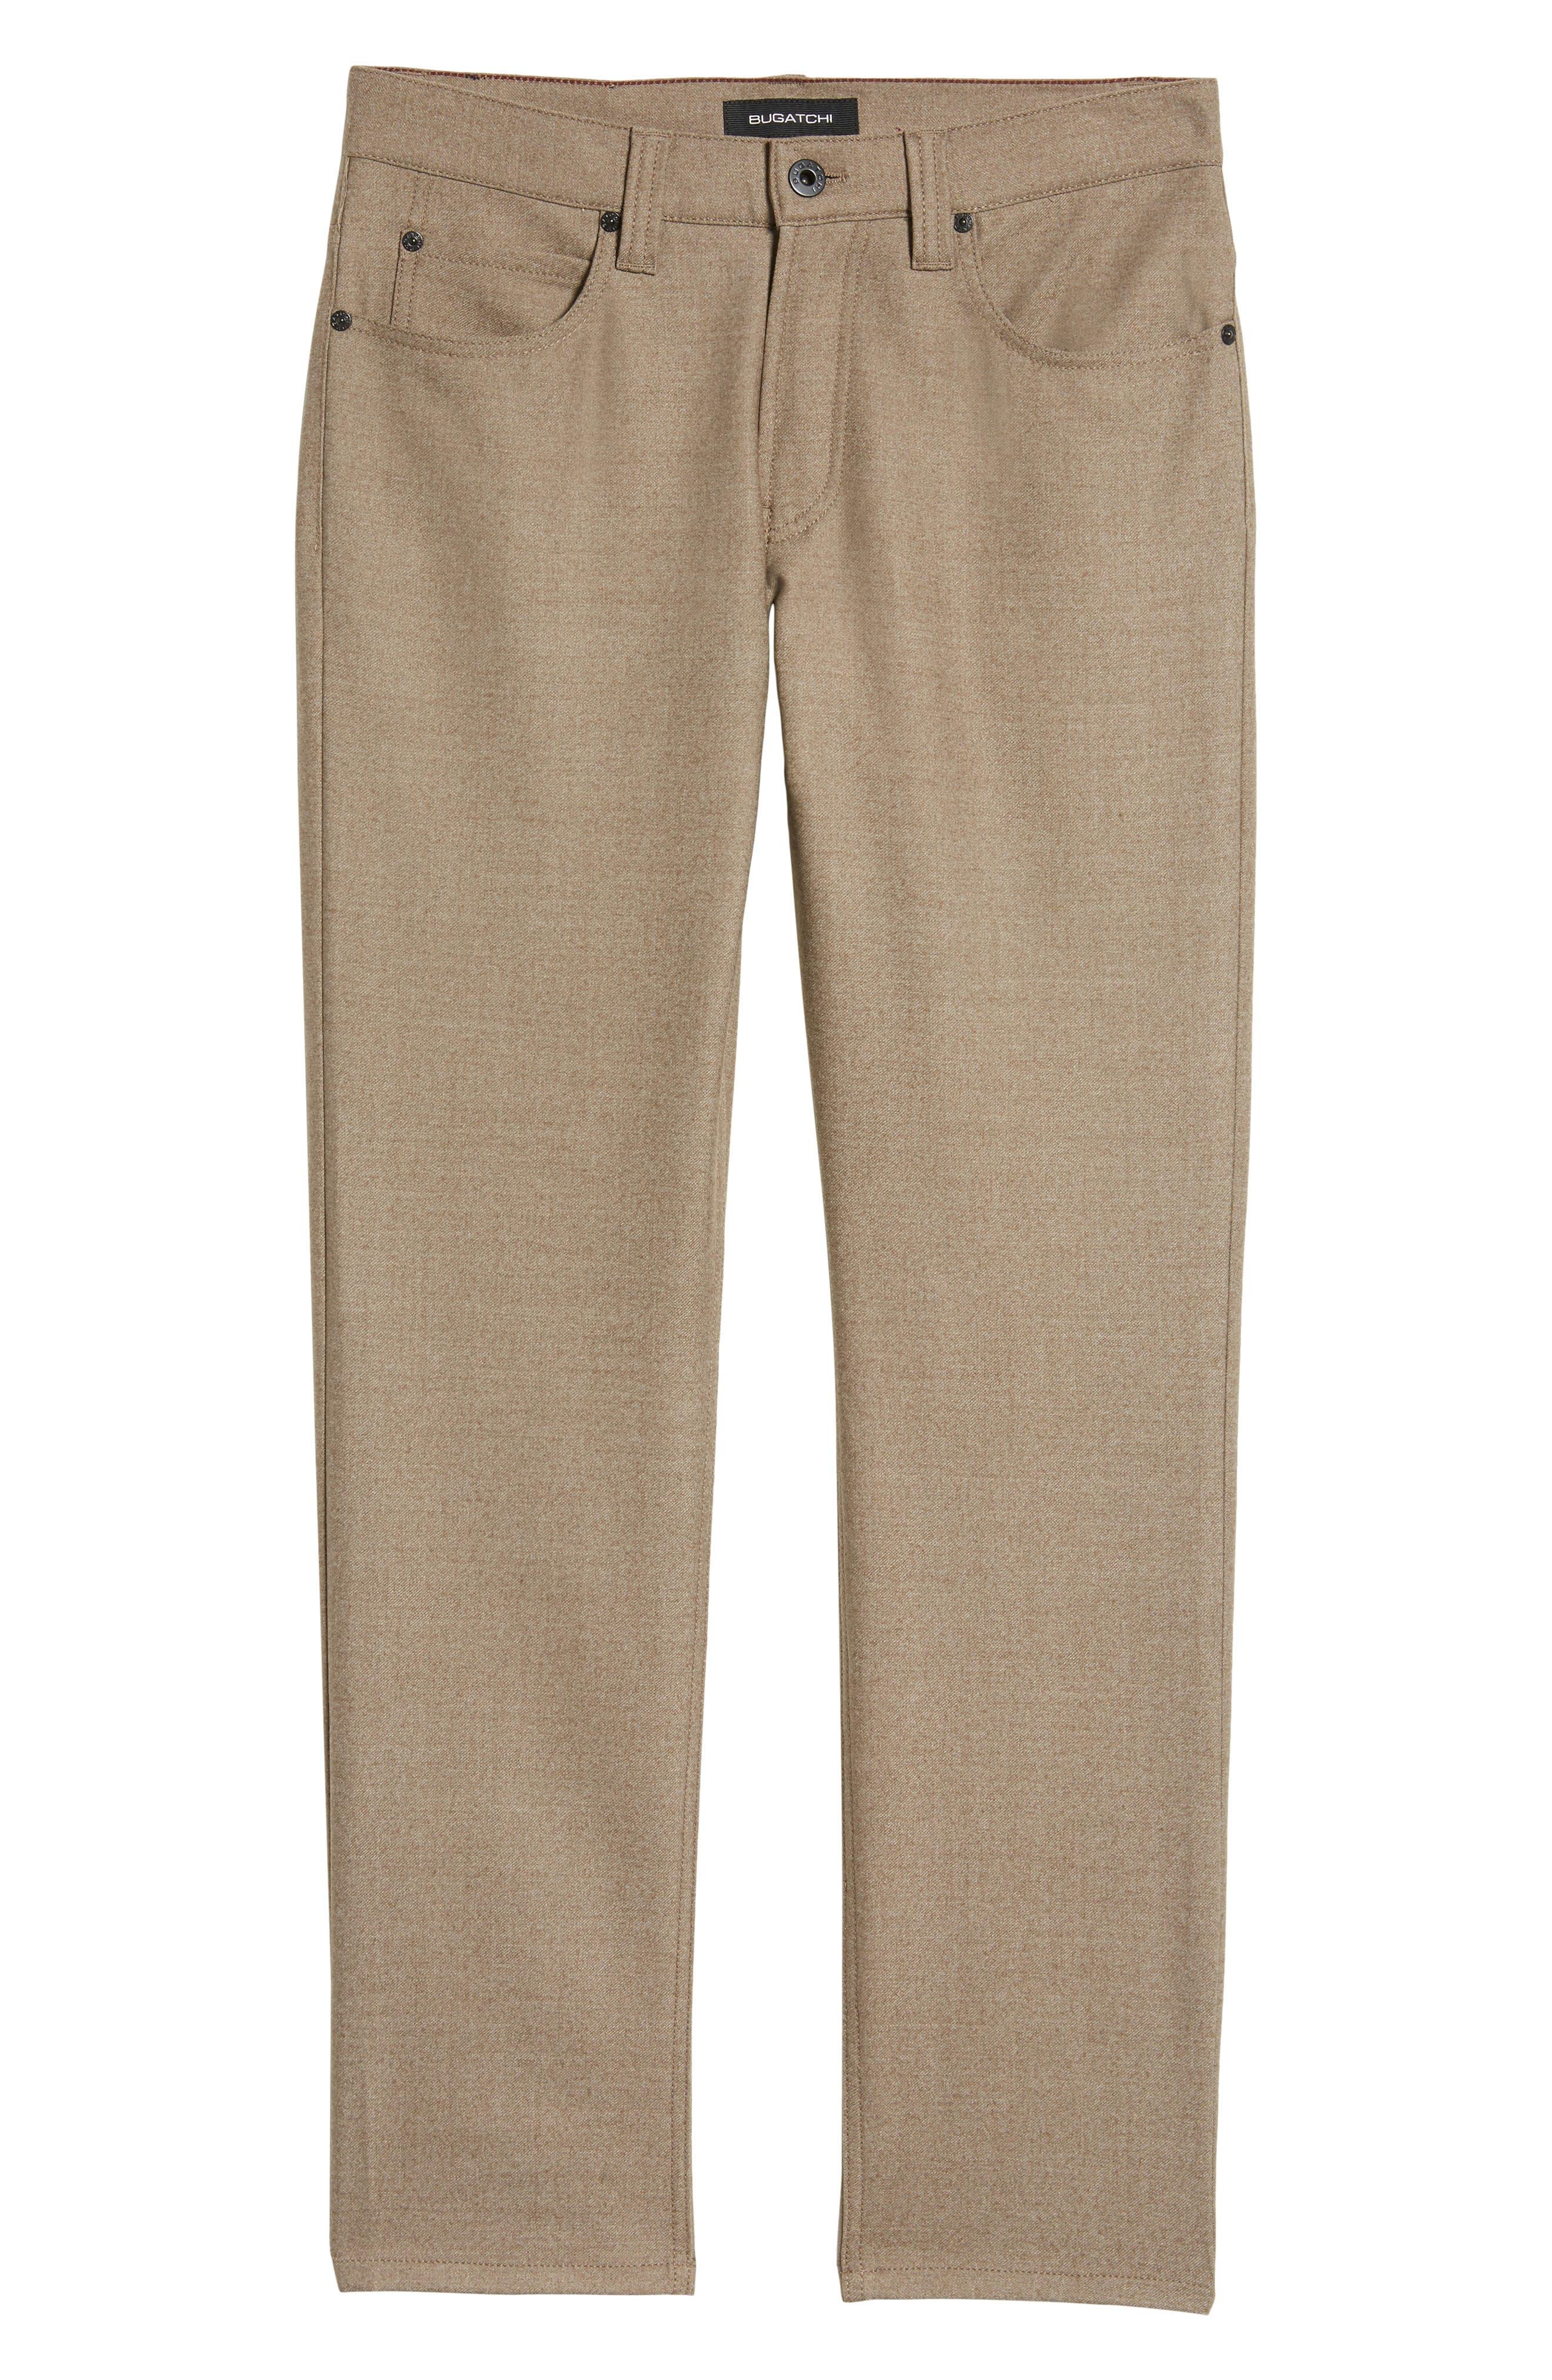 Wool Blend Pants,                             Alternate thumbnail 6, color,                             208